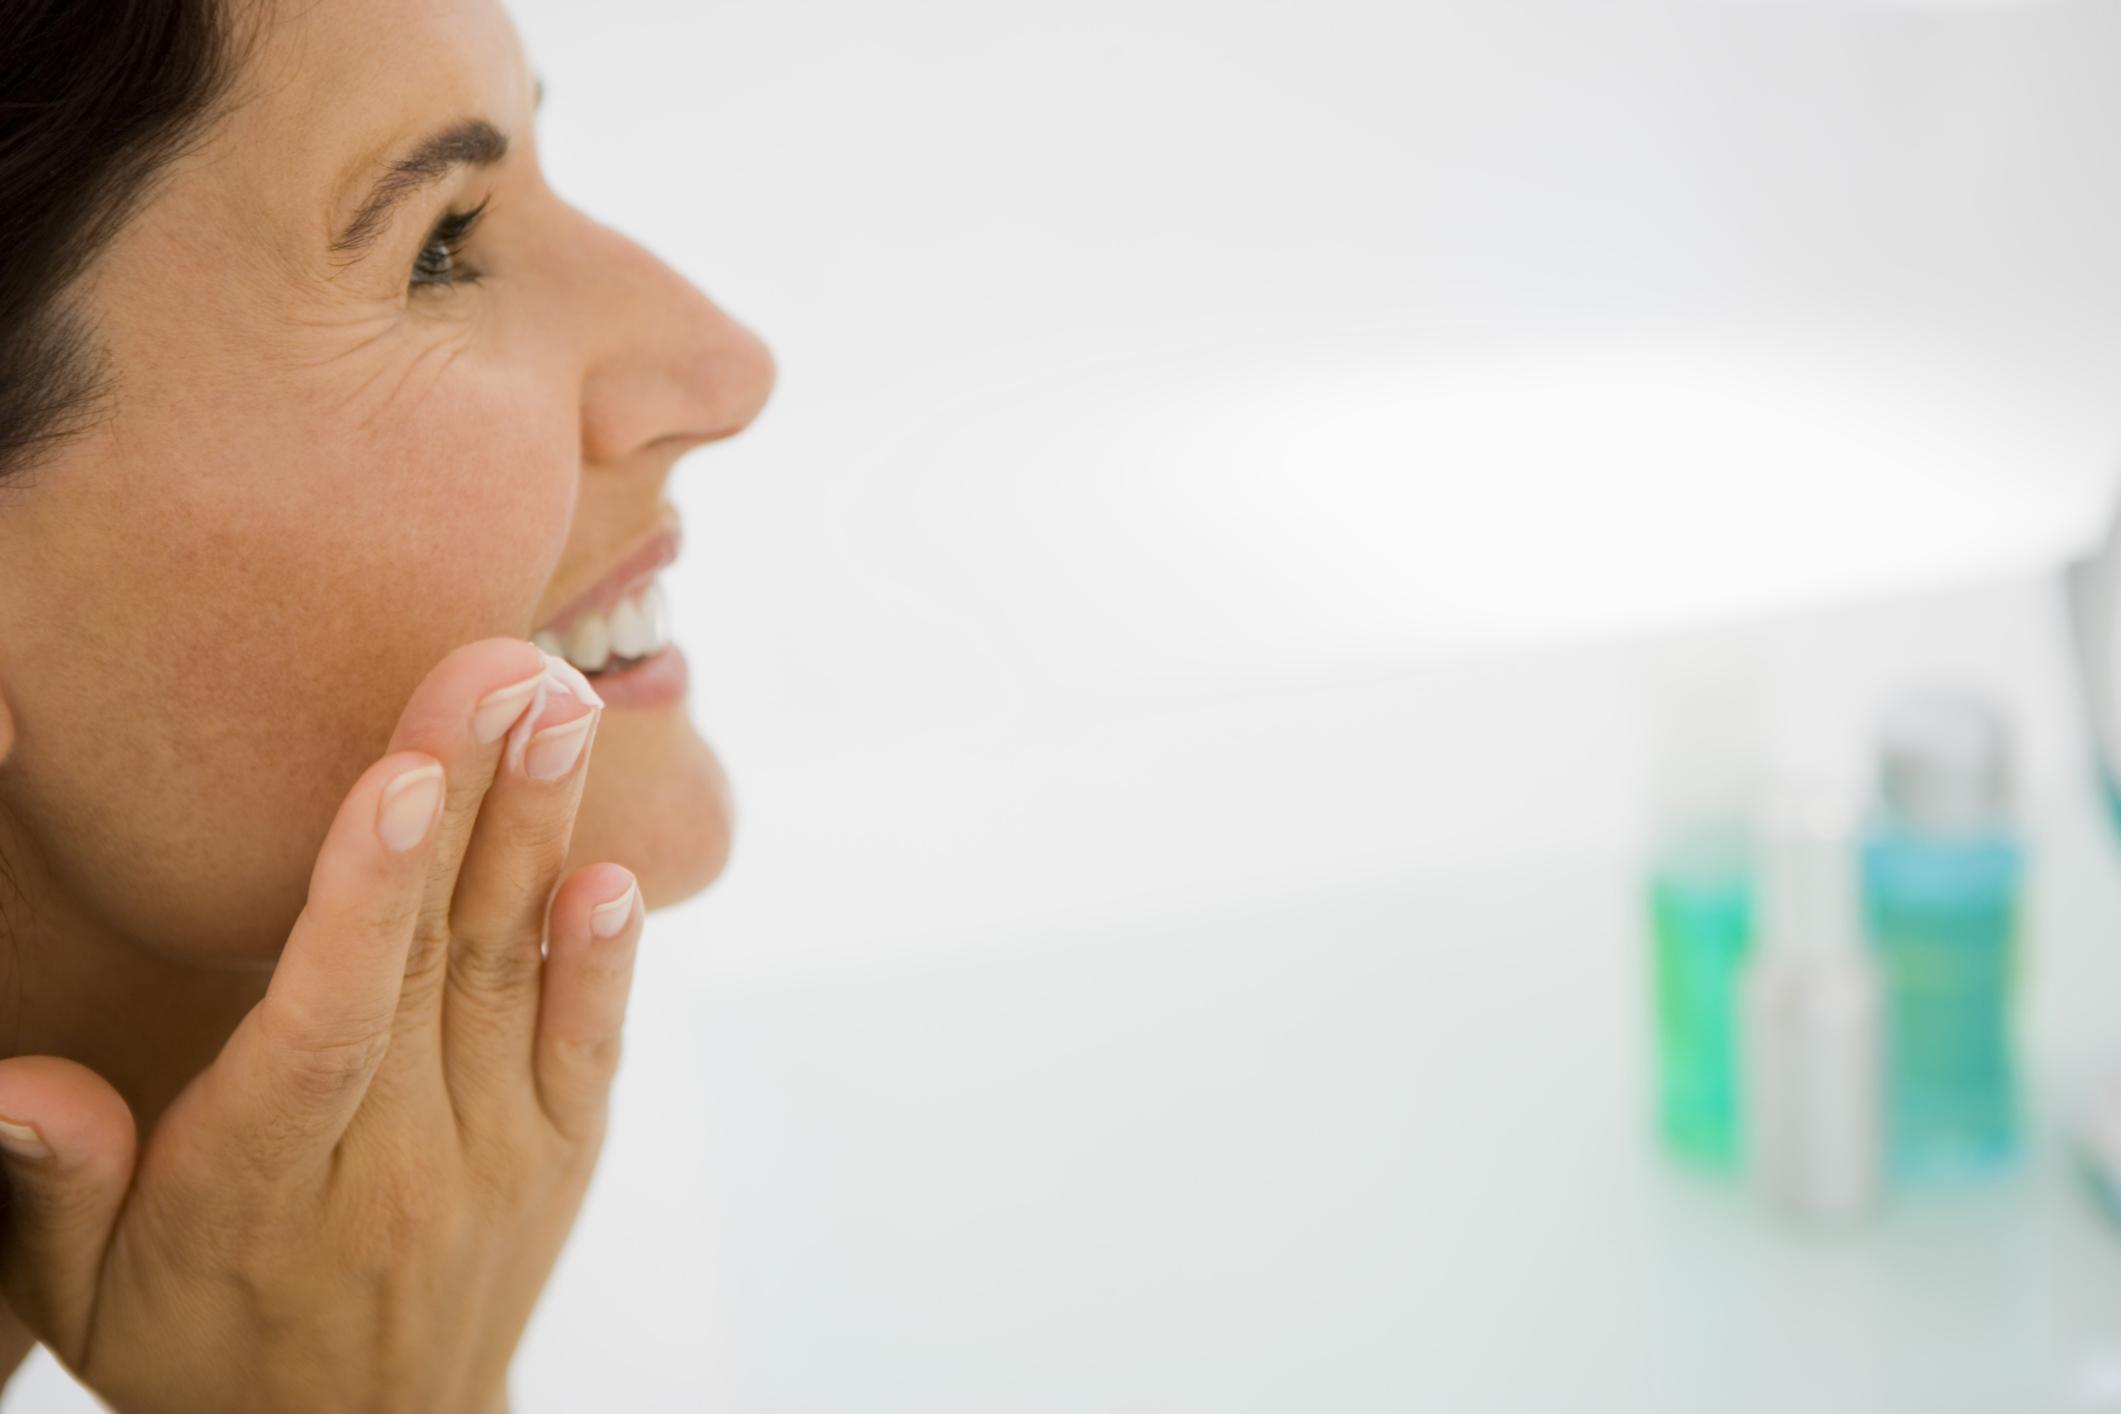 Remedies for Dark Pigmentation | LEAFtv